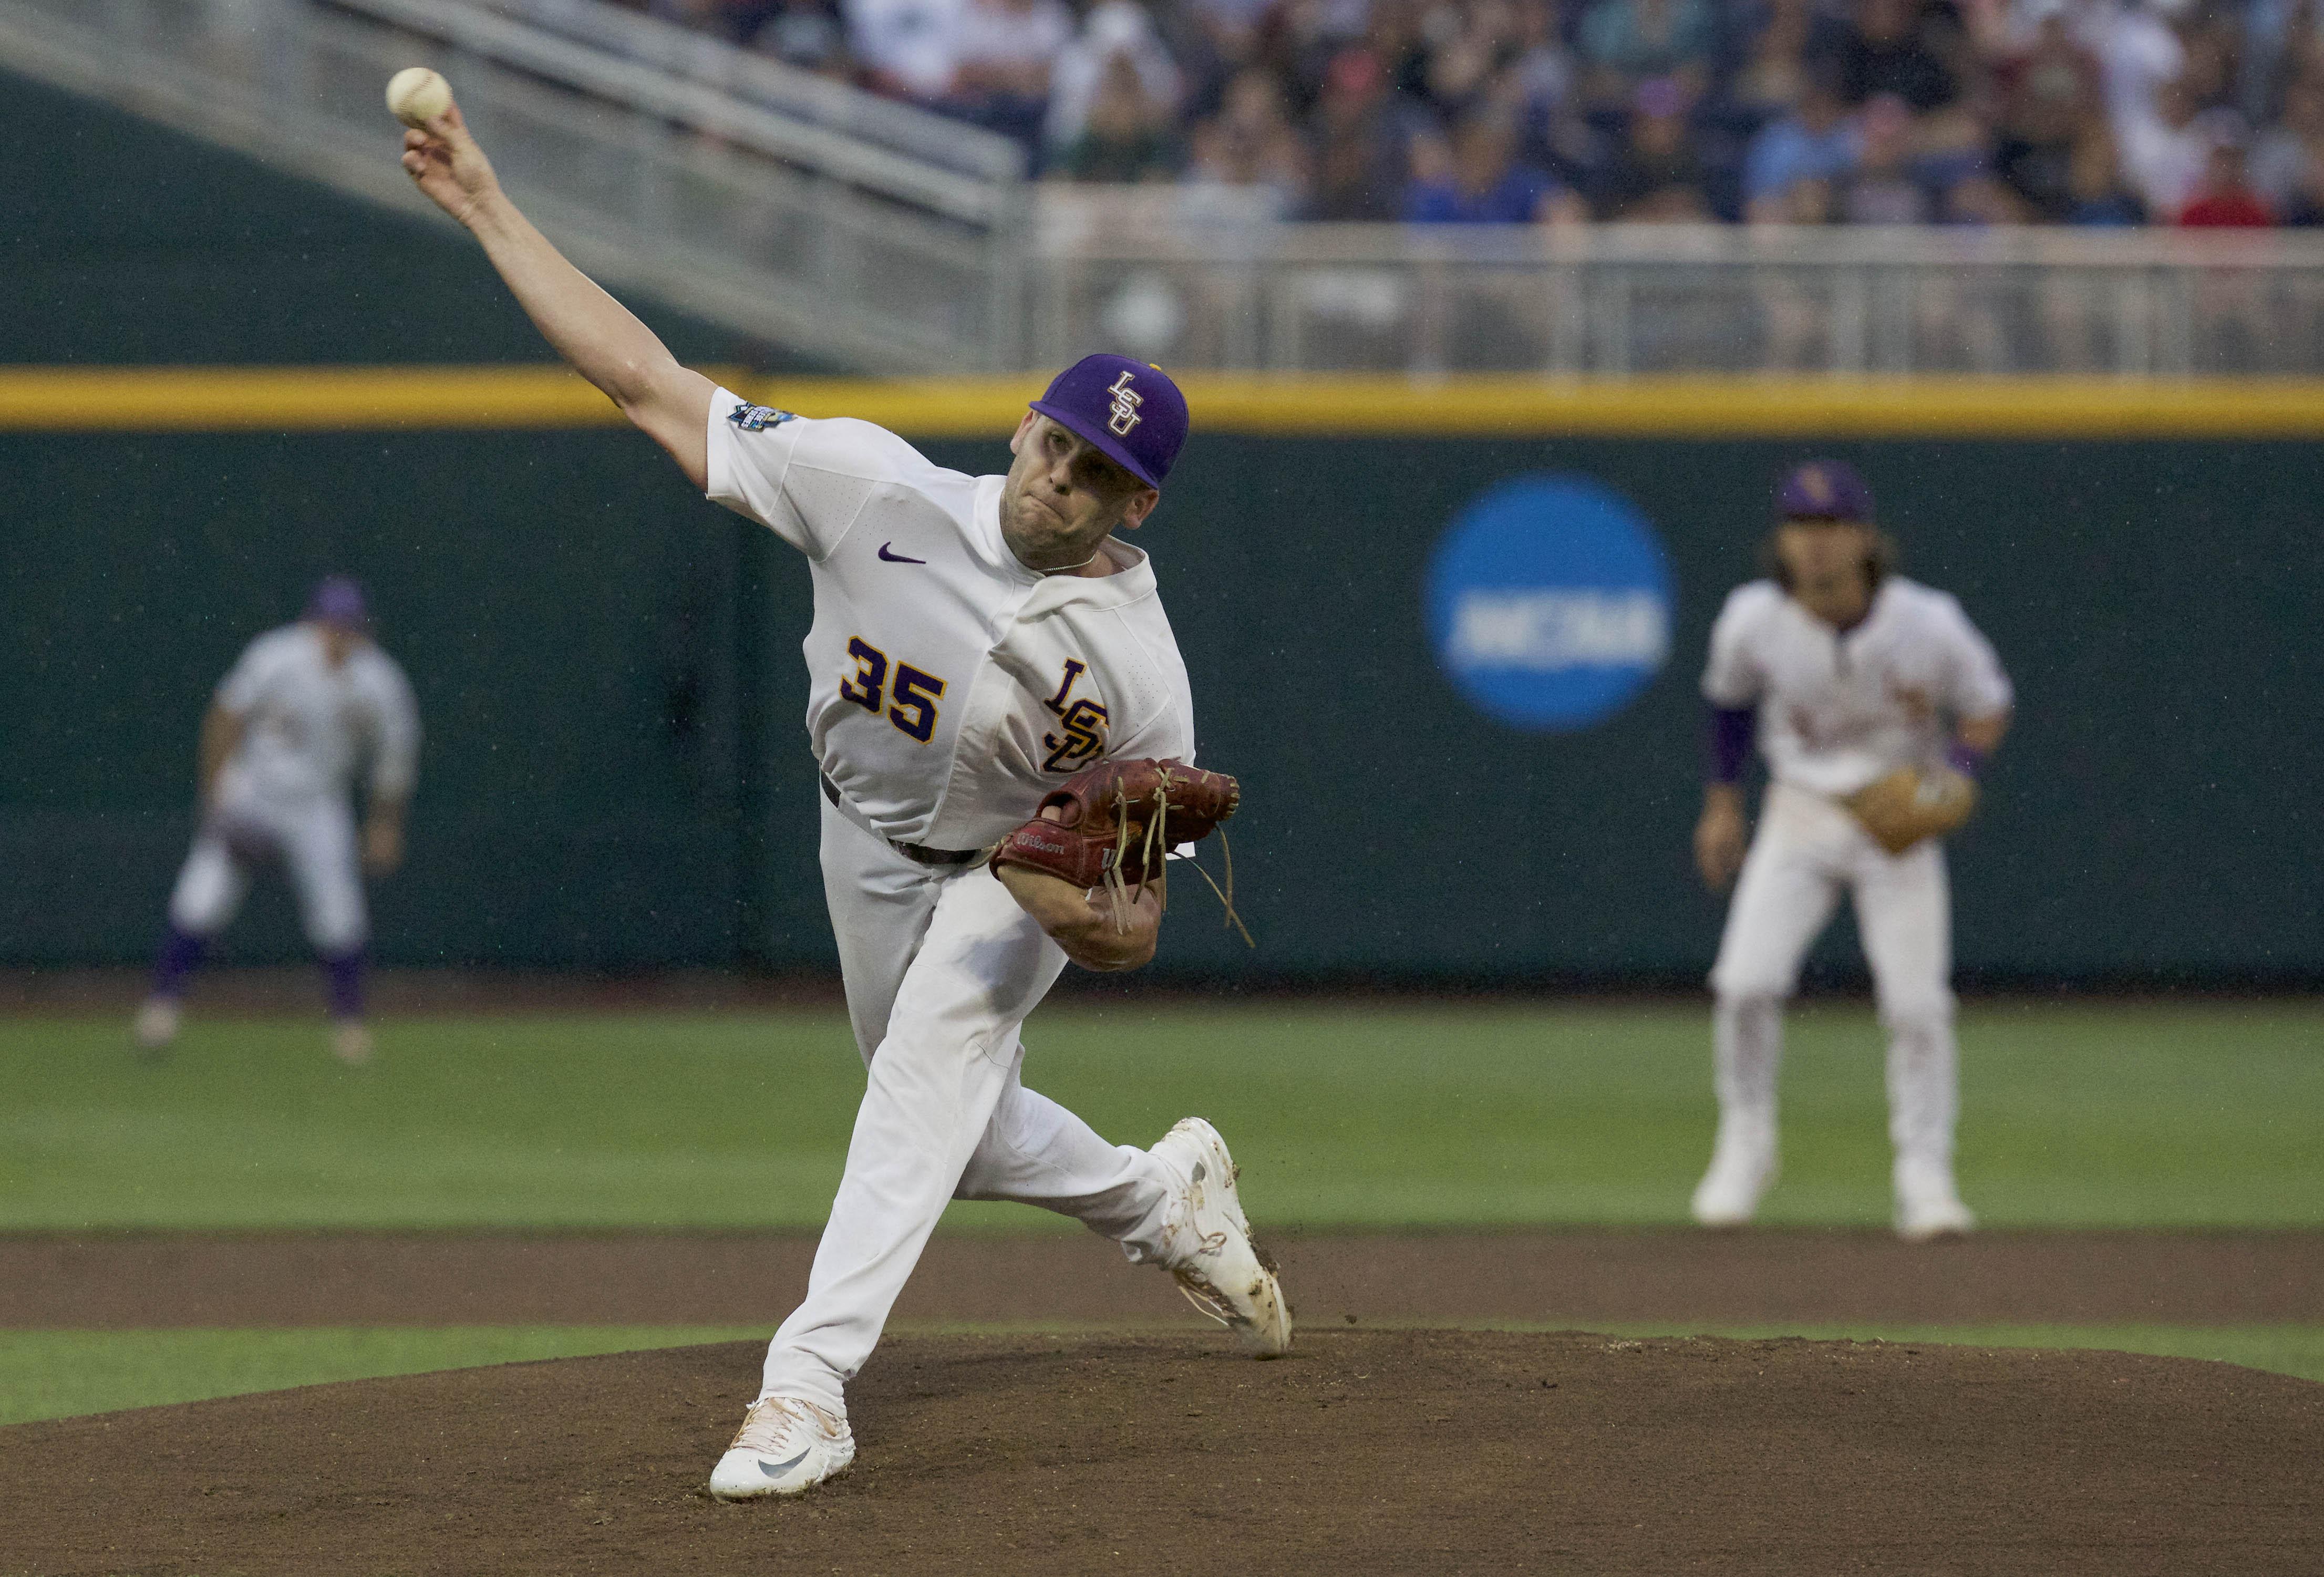 10117744-ncaa-baseball-college-world-series-florida-state-vs-lsu